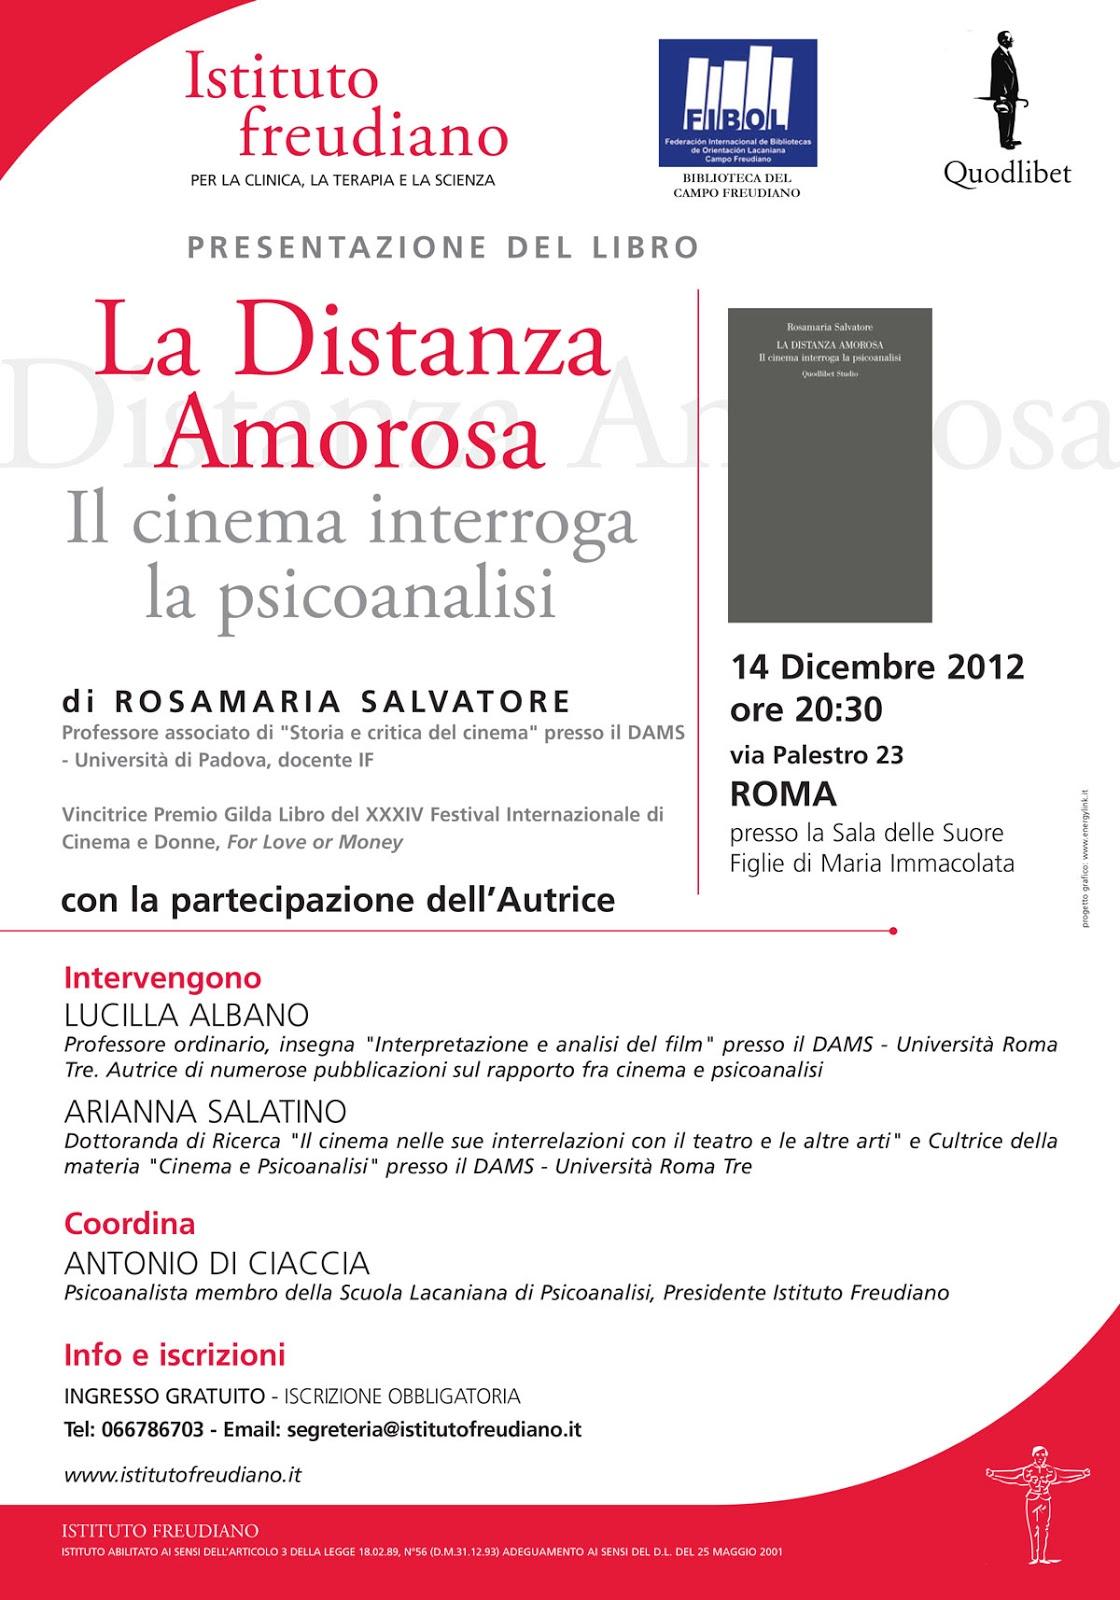 http://2.bp.blogspot.com/-v8X2gudtudU/UMnbM4MHRkI/AAAAAAAAArw/Ptz5DqecC-g/s1600/Presentazione+Libro+La+distanza+amorosa+14:12:12+ore+20,30+ROMA.jpg